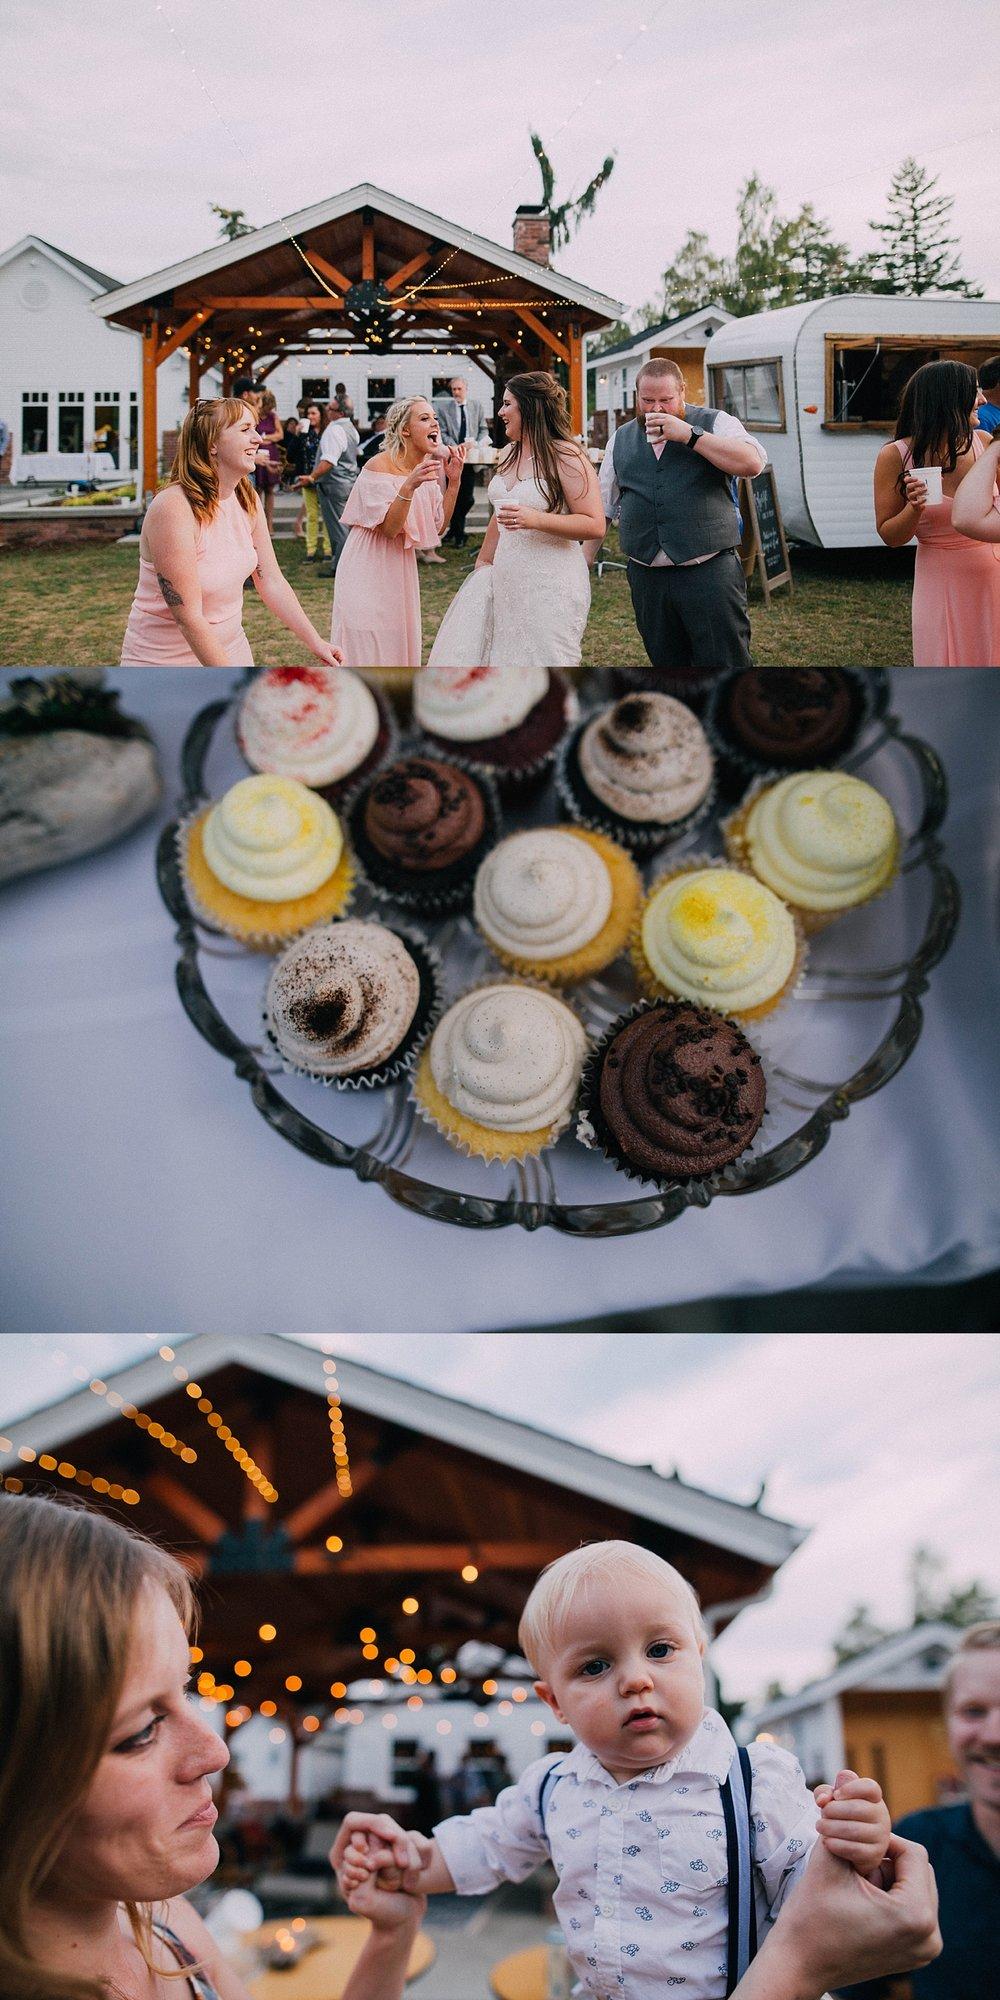 karisa ryan - vashon island backyard wedding photographer - seattle area backyard wedding photography - ashley vos-29.jpg